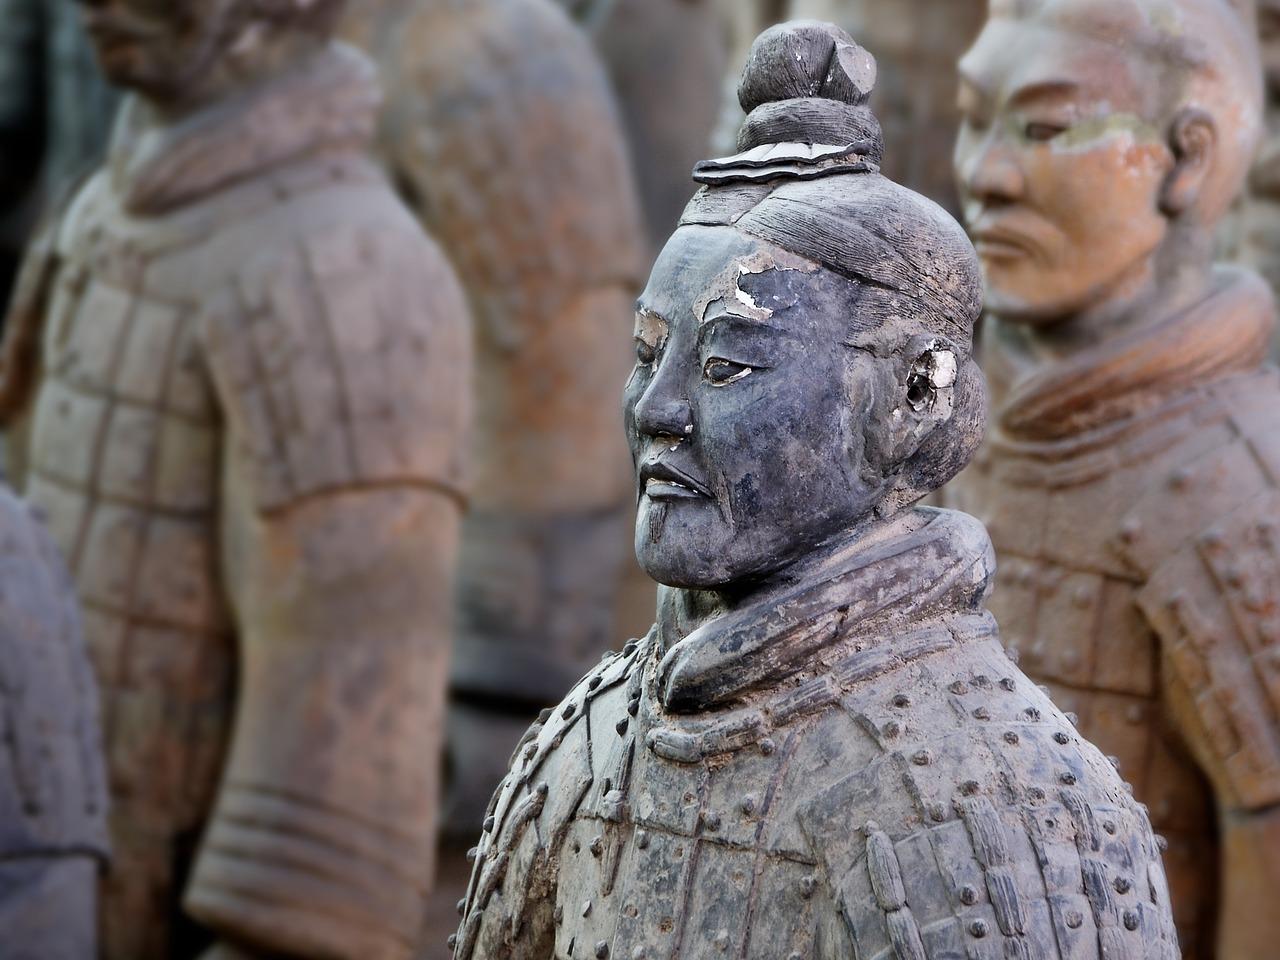 terracotta-army-1864984_1280